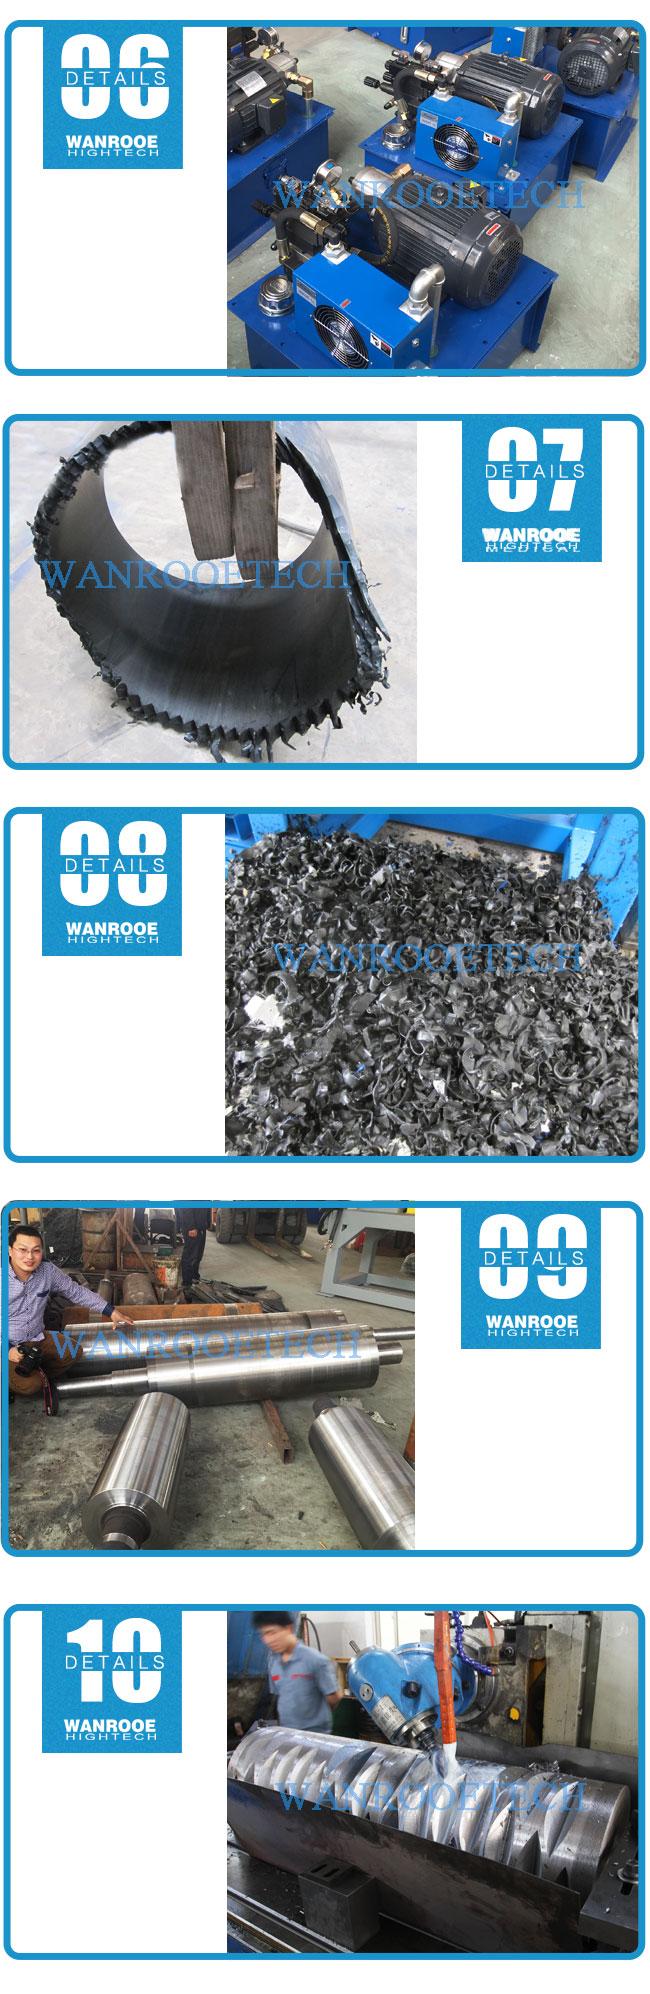 Large Diameter PVC, HDPE, Corrugated Pipe Horizontal Shredder Machine-detail-6